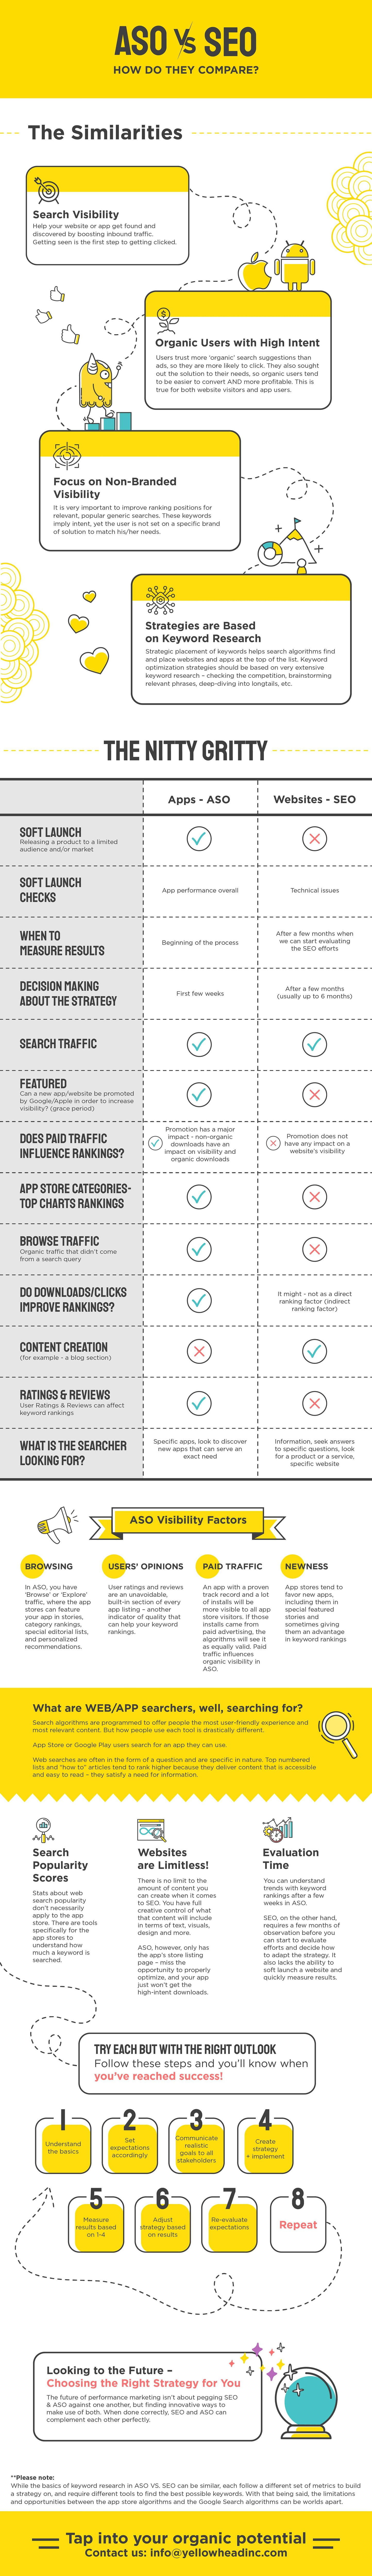 ASO vs SEO Infographic